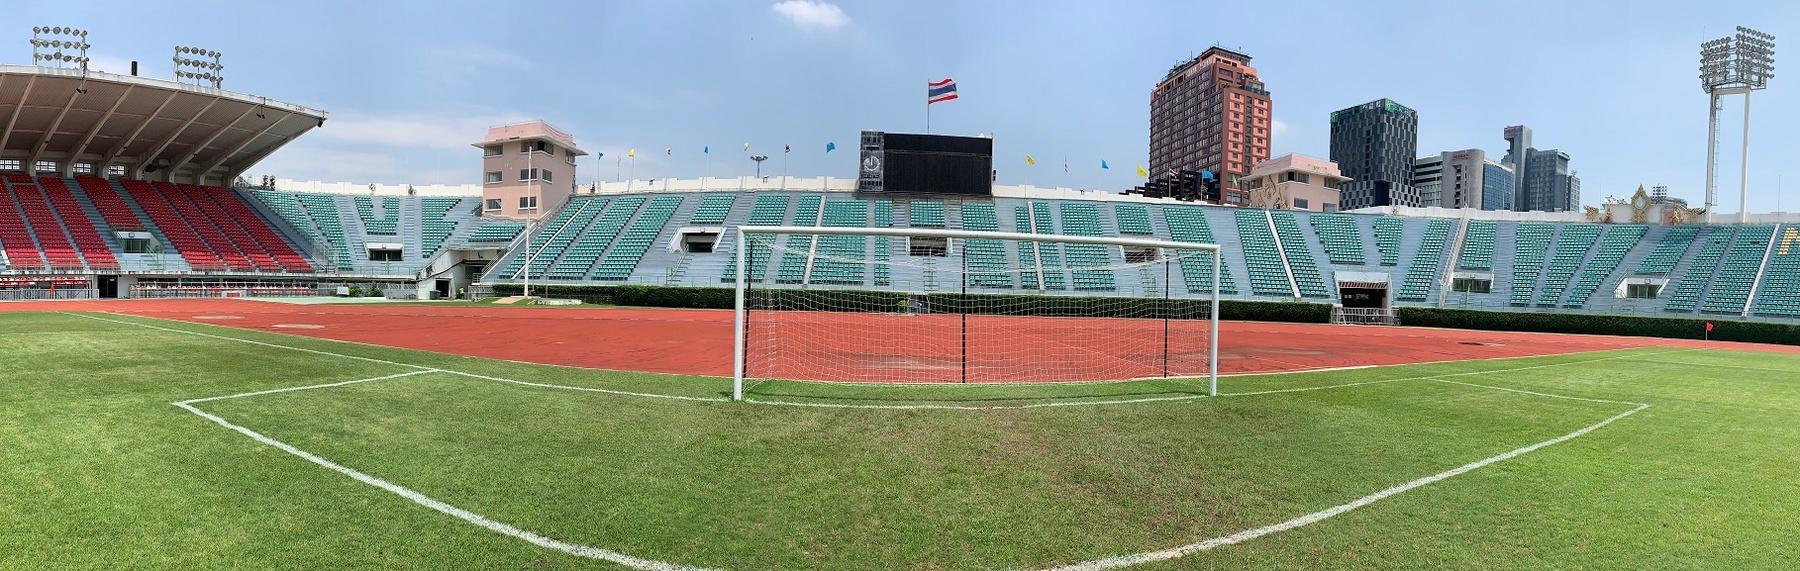 Thai National Stadium pitch